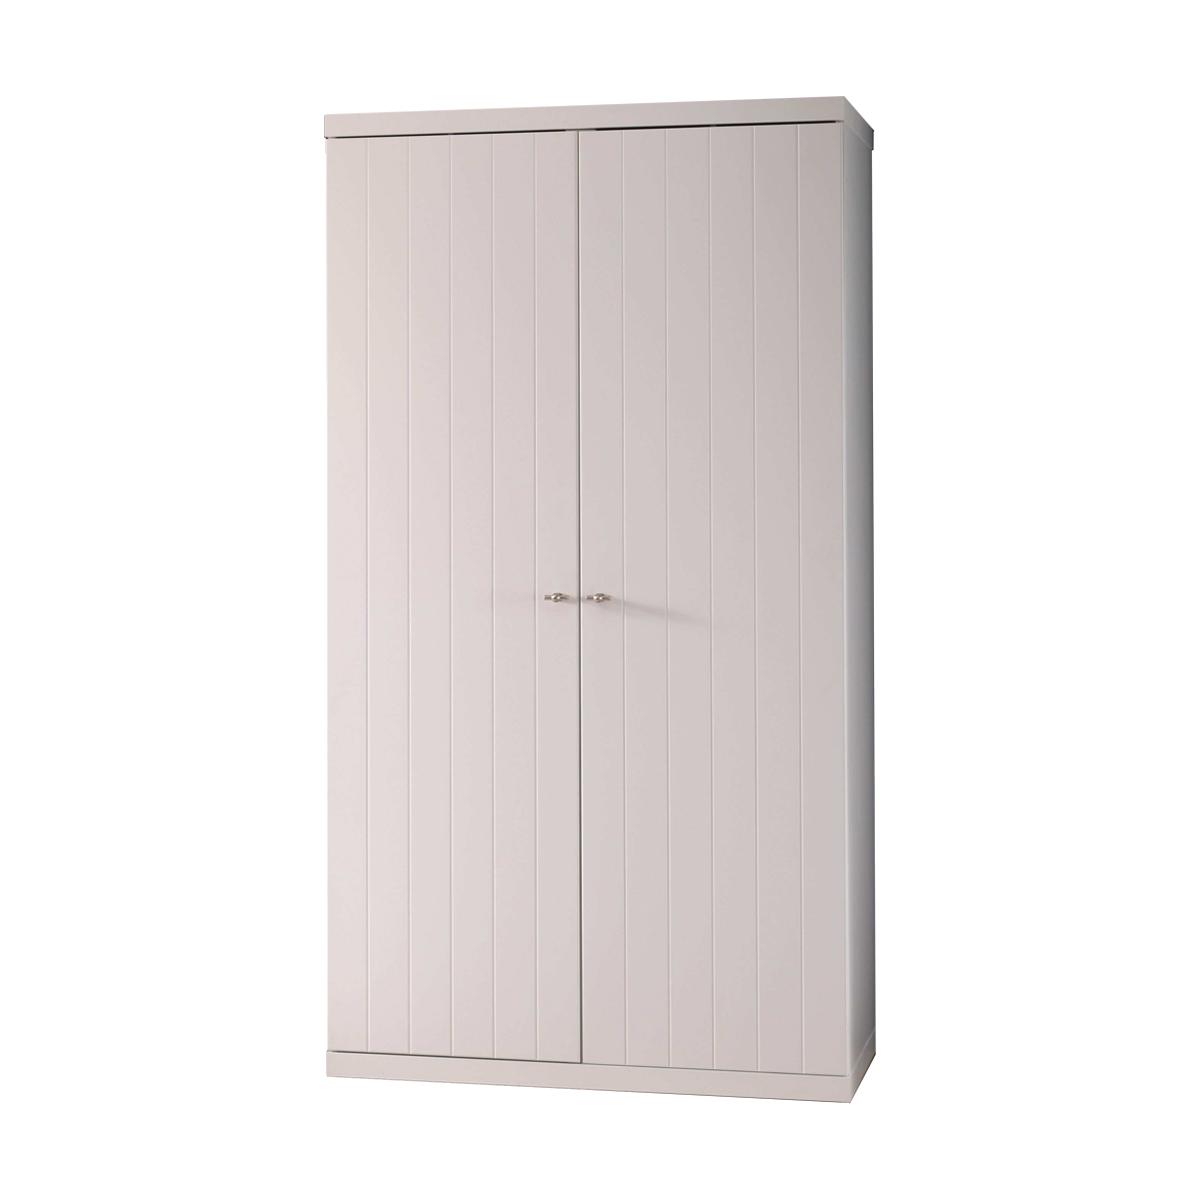 Vipack - Armoire 2 portes Robin - Blanc